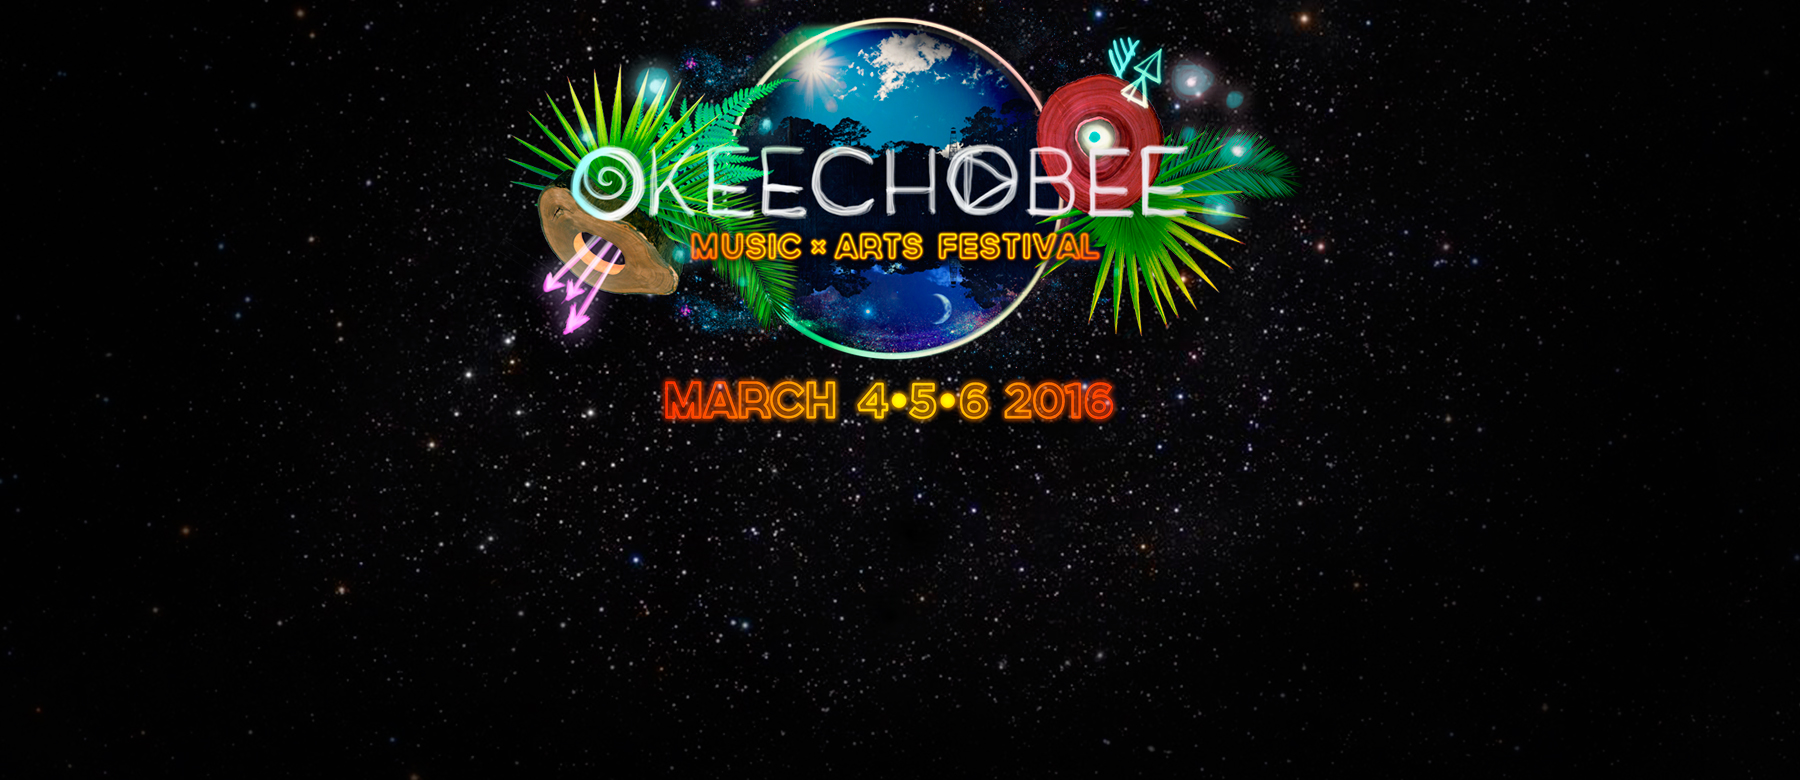 Okeechobee Music and Arts Festival 2016